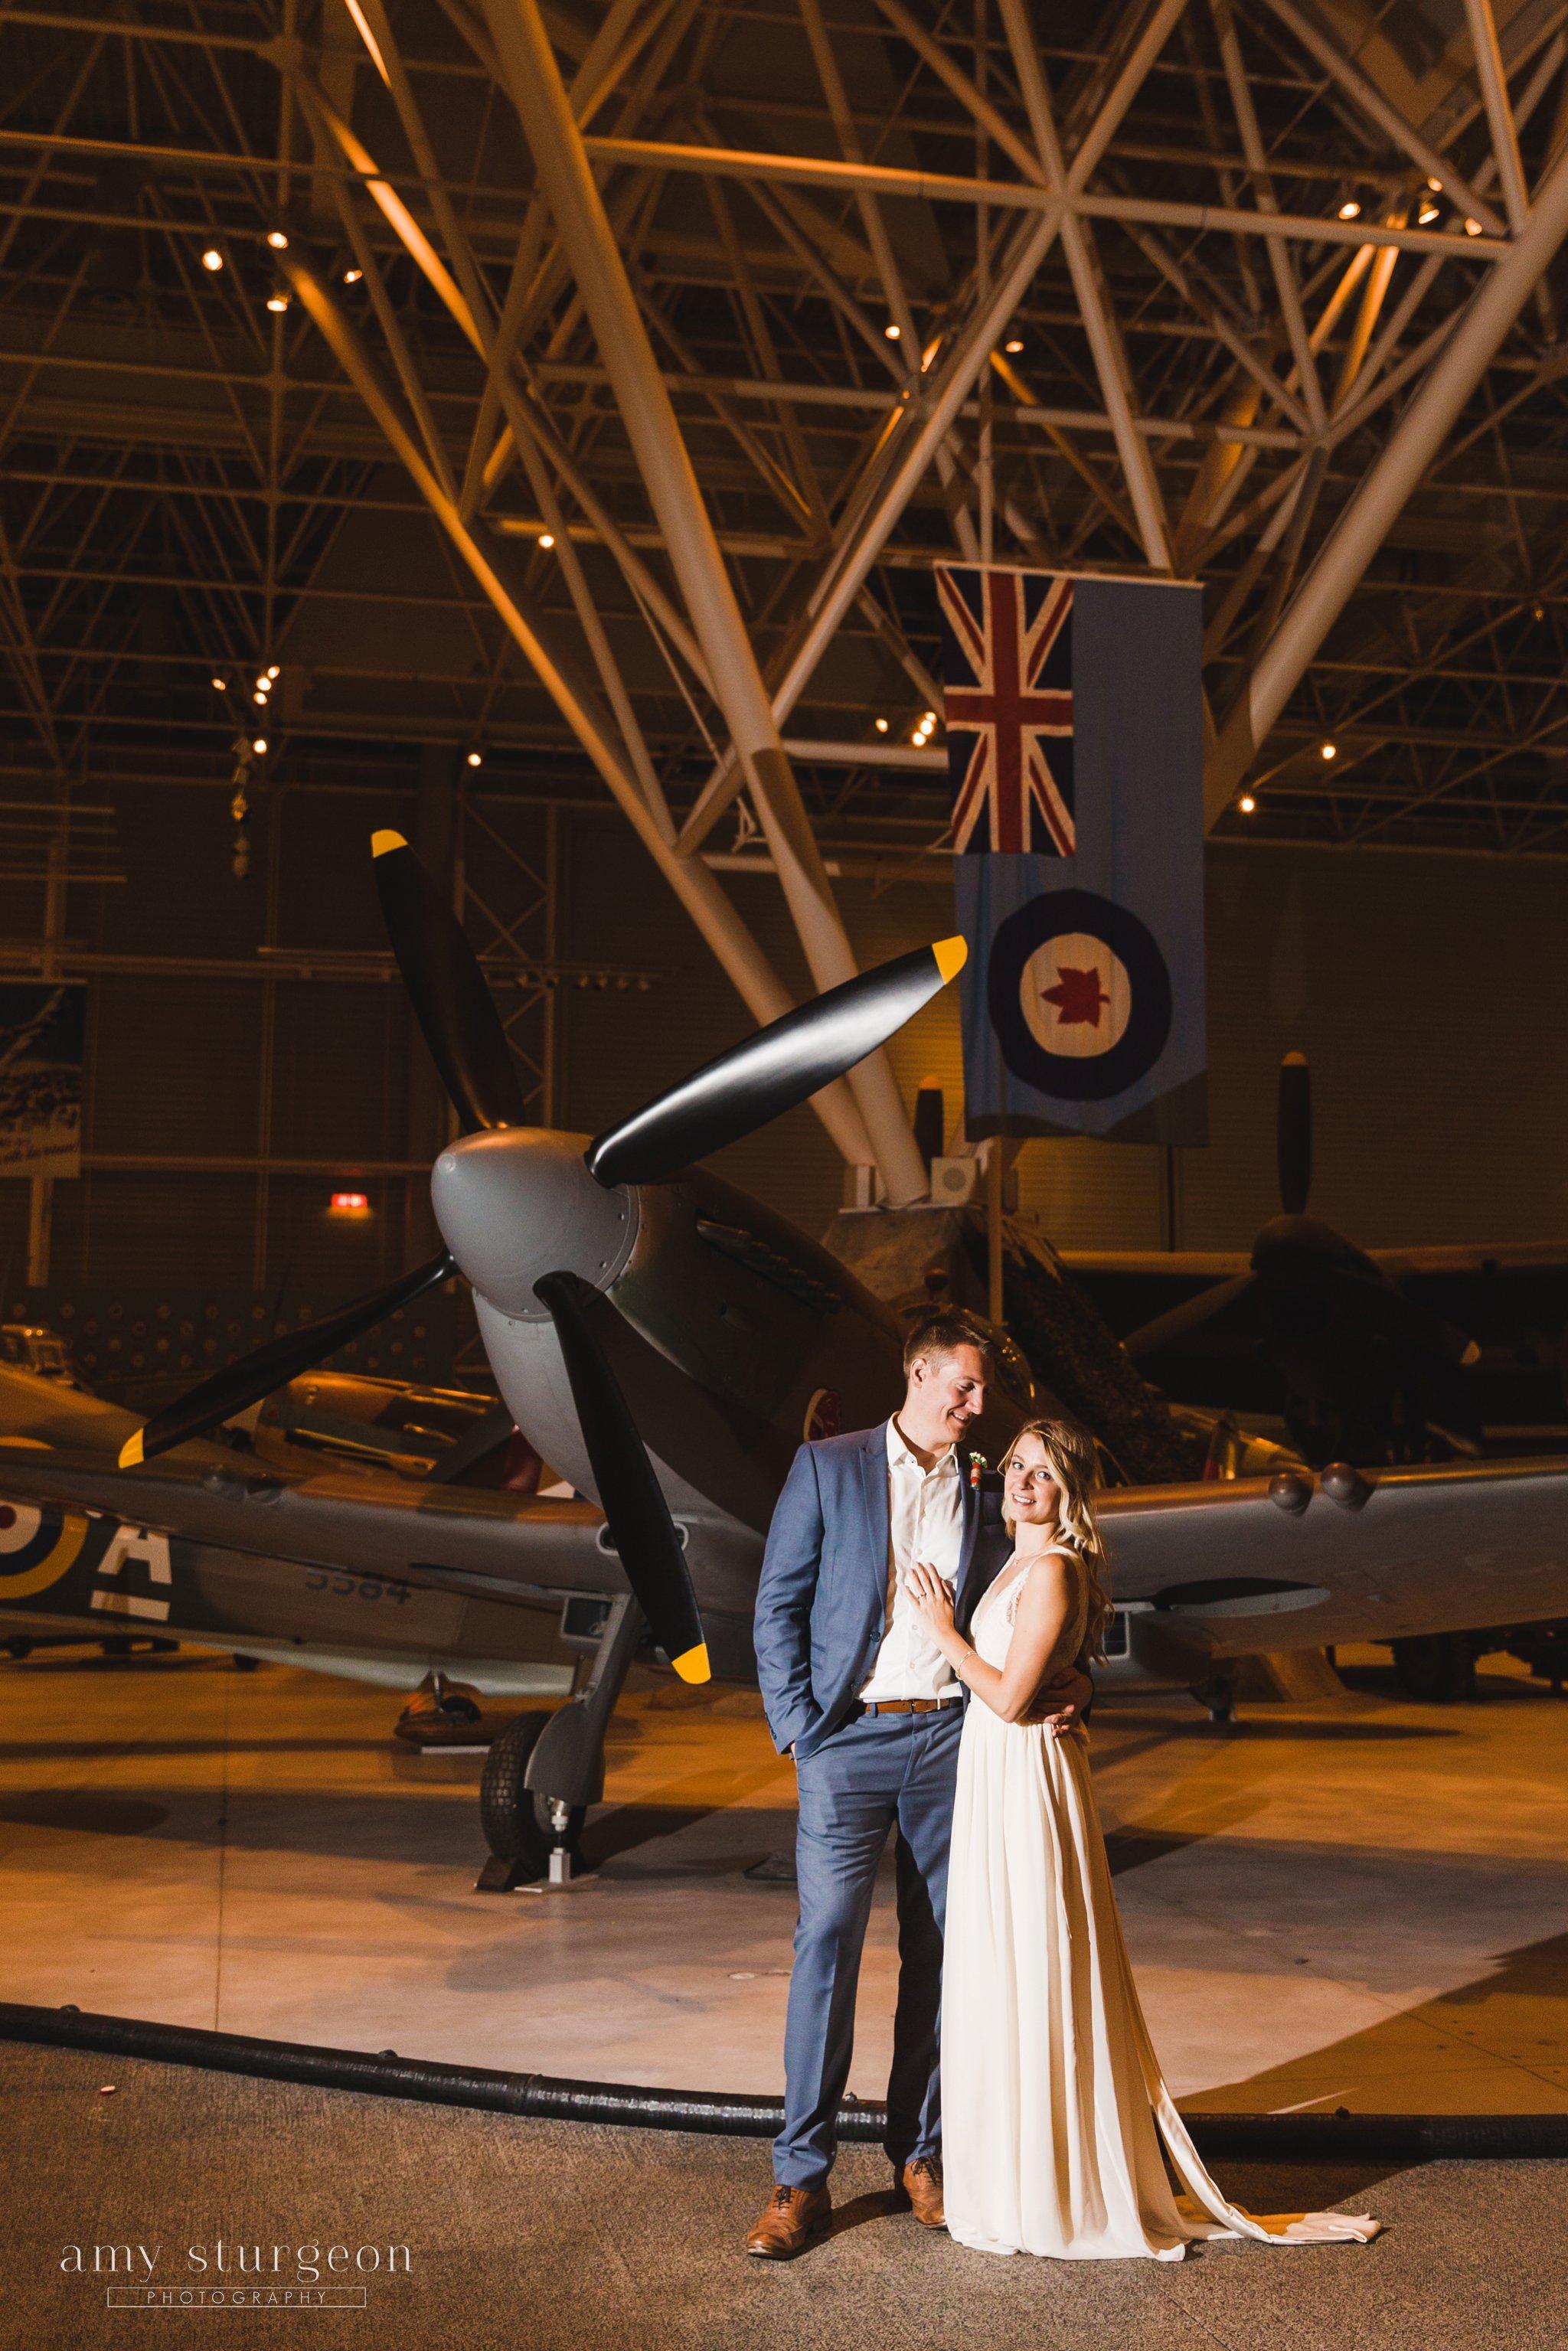 amy-sturgeon-photography_canadian-aviation-museum-wedding_0102